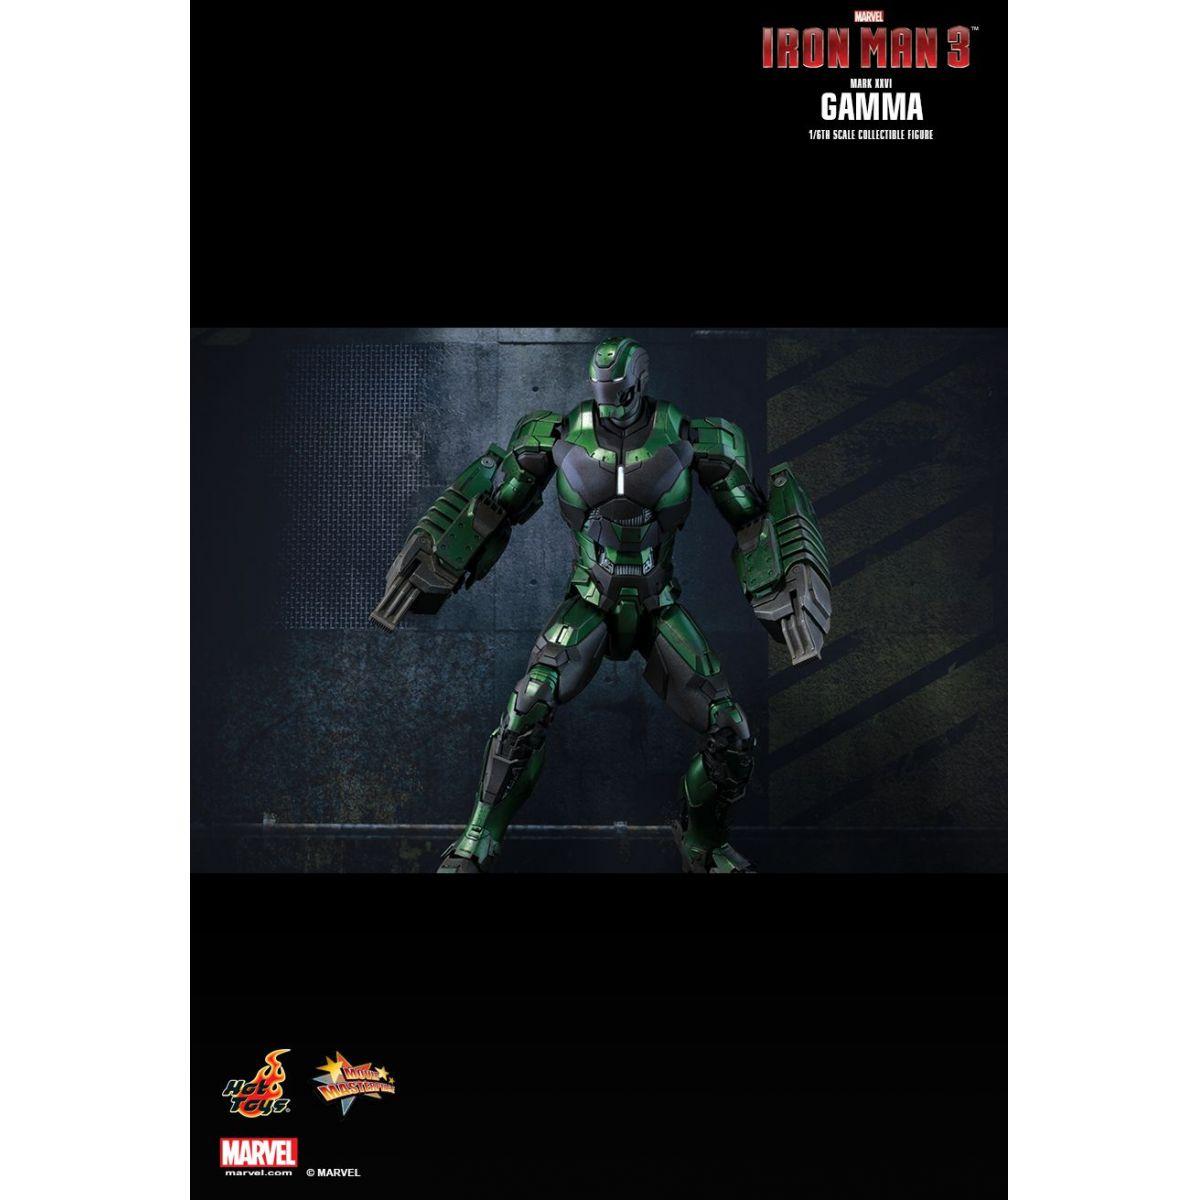 Boneco Iron Man Mark XXVI Gamma: Homem de Ferro 3 (Iron Man 3) Exclusive Escala 1/6 - Hot Toys - CD